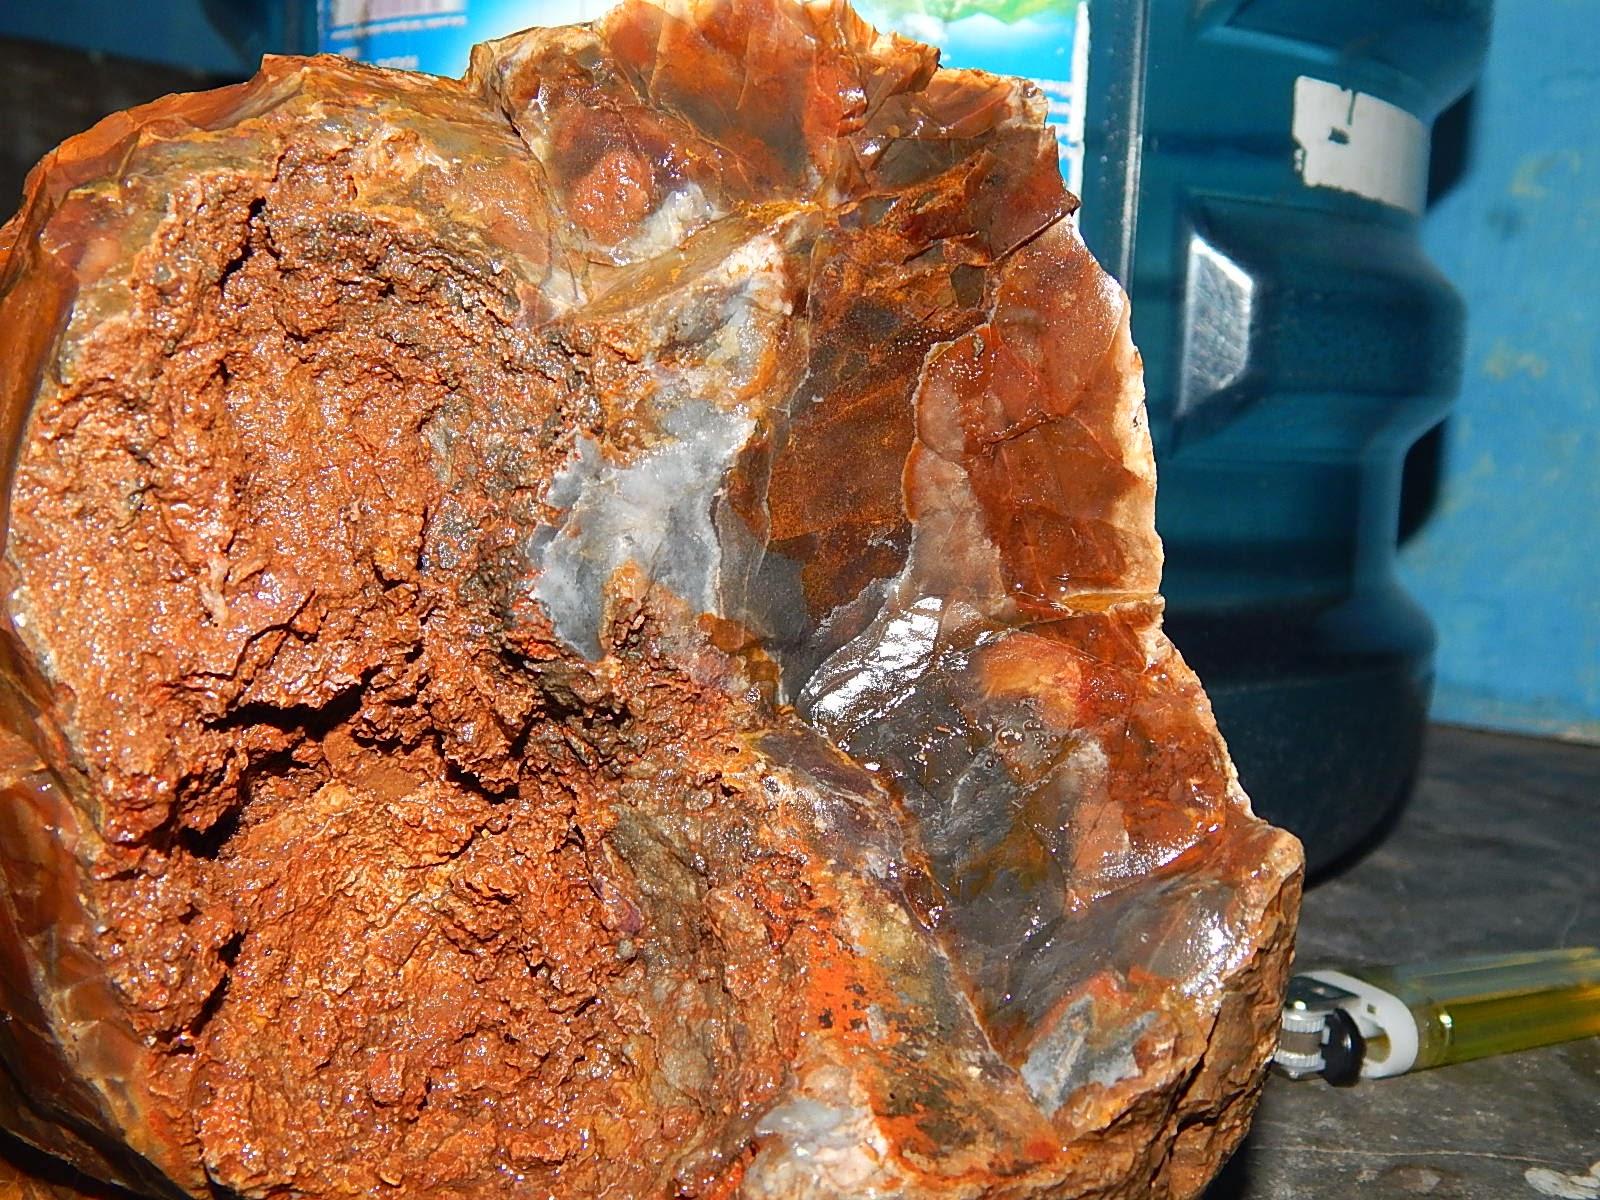 Bongkahan Panca Warna Dari Boak Sumbawa